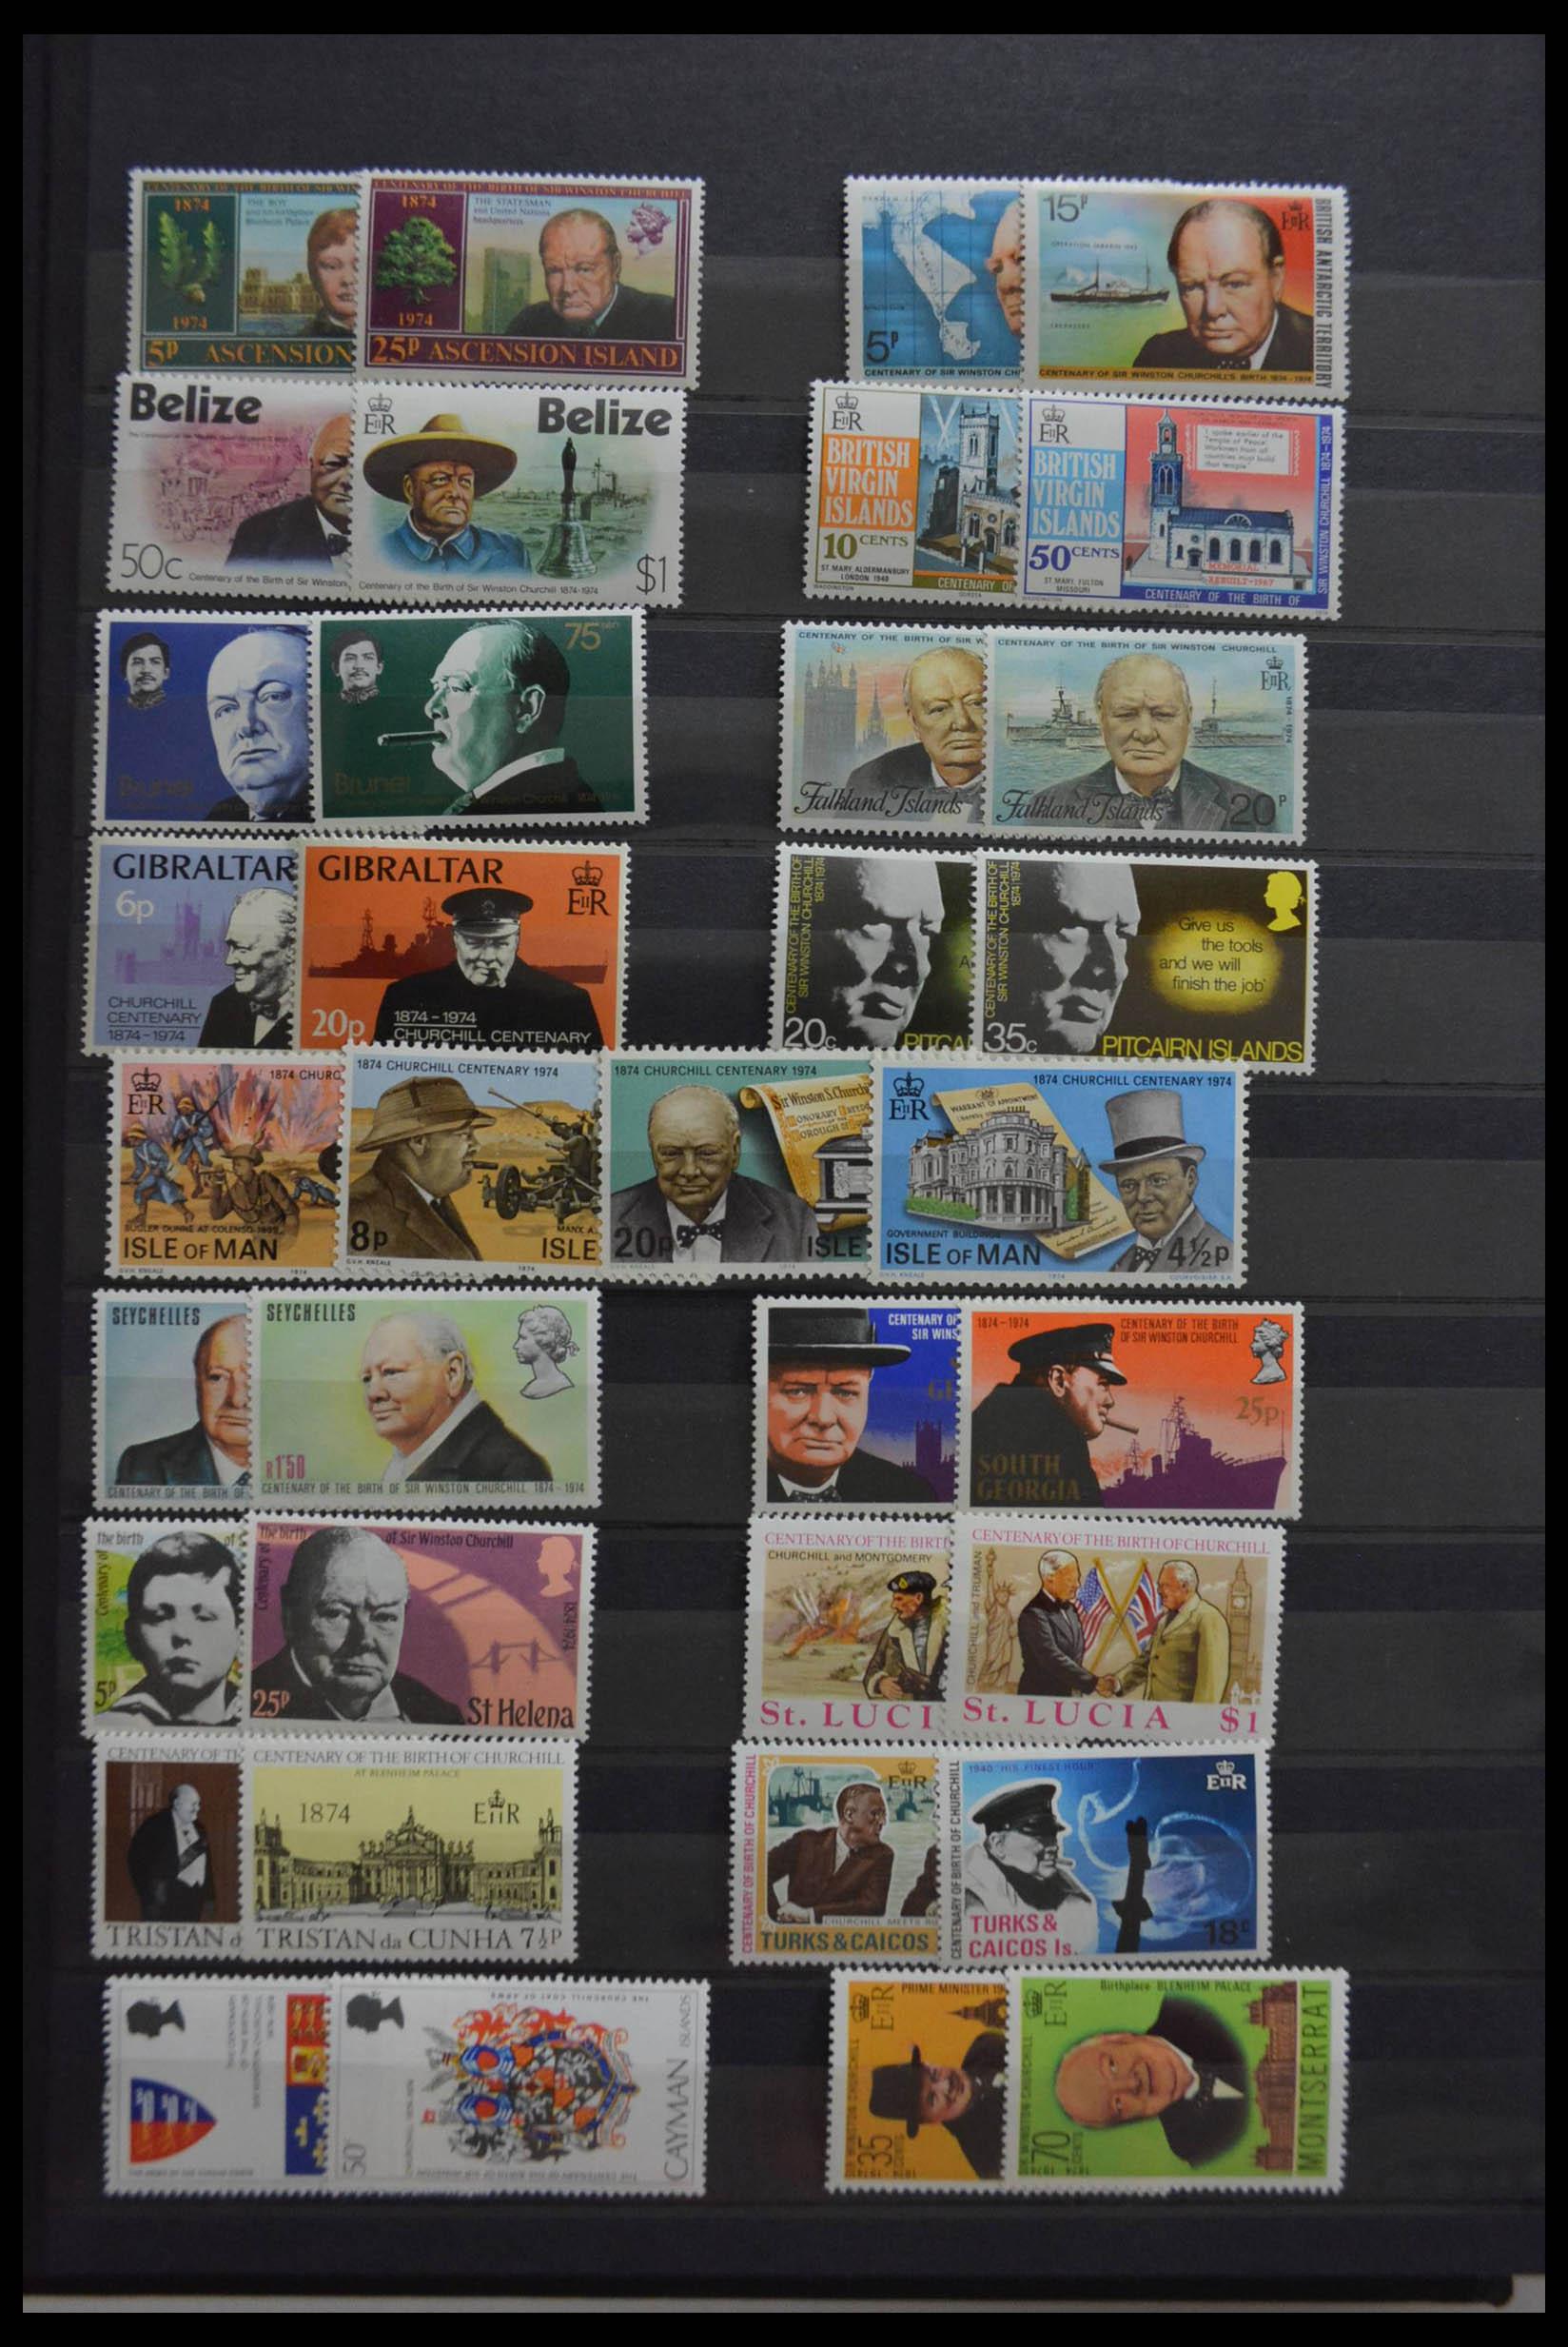 28512 002 - Postzegelverzameling 28512 Britse Gemenebest postfris.